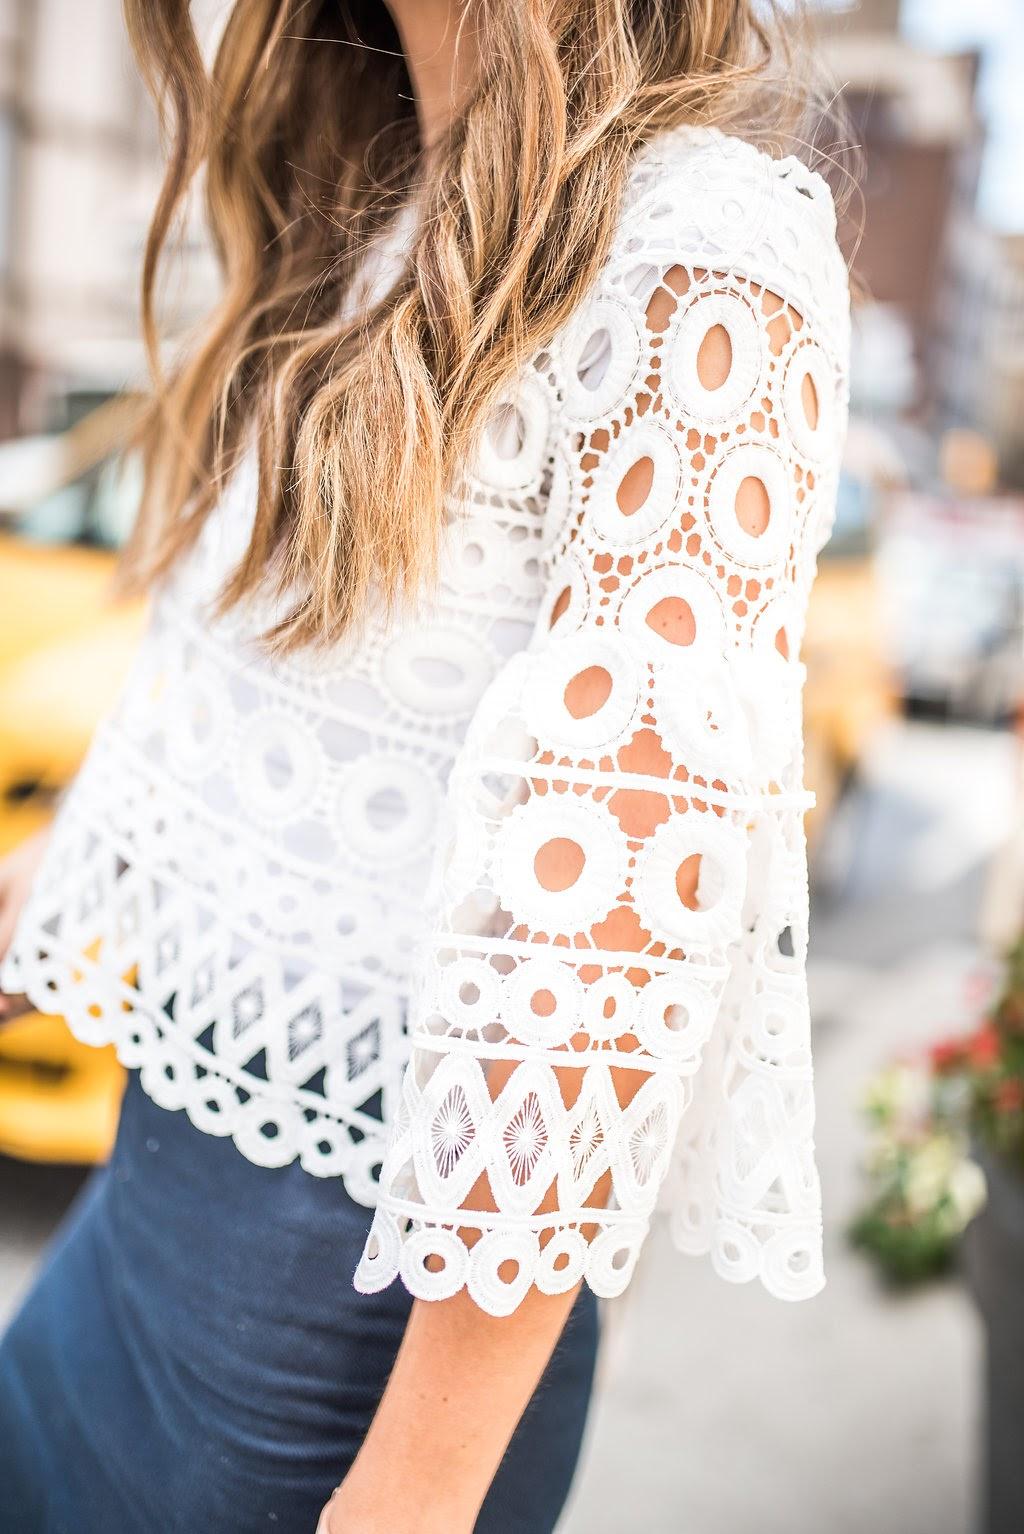 Merrick's Art White Lace Top